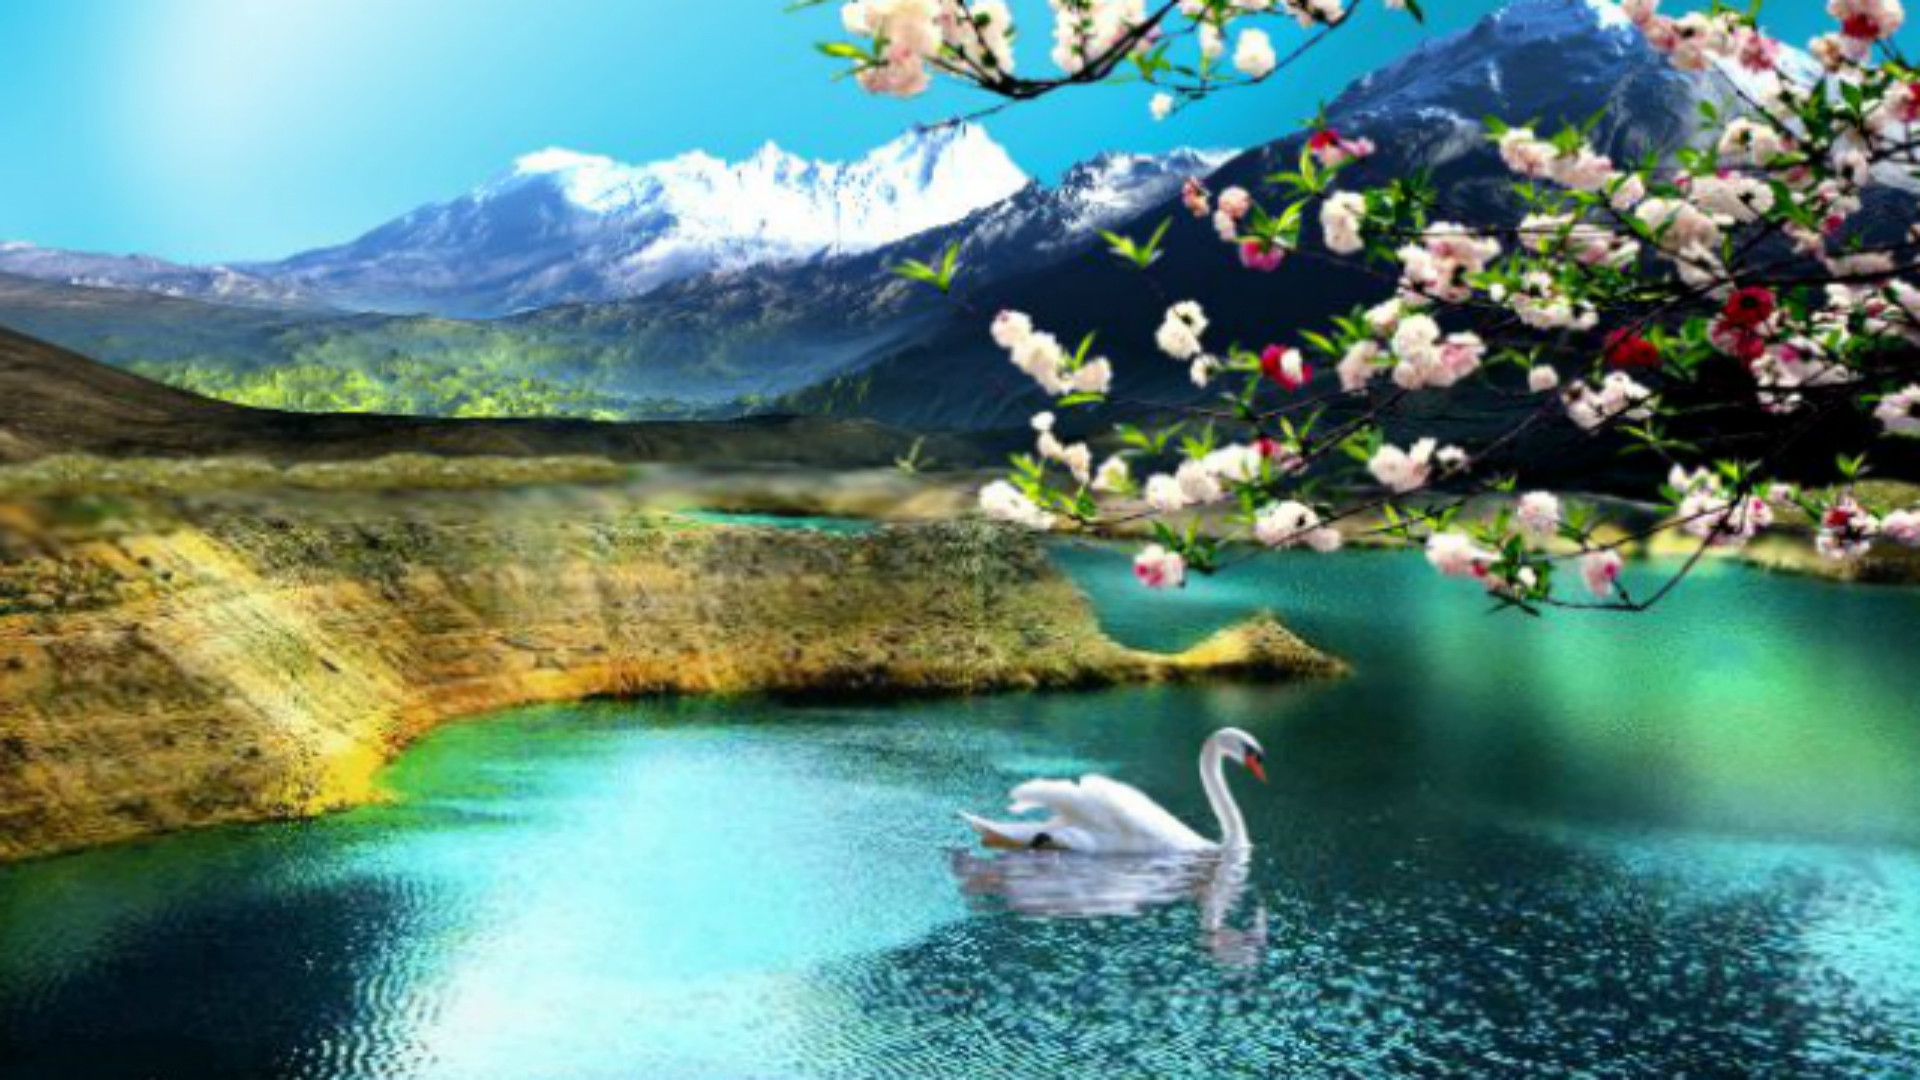 Hd Nature Wallpapers, Flowers, Cute Desktop Images, - Nature Wallpaper For Windows 10 - HD Wallpaper